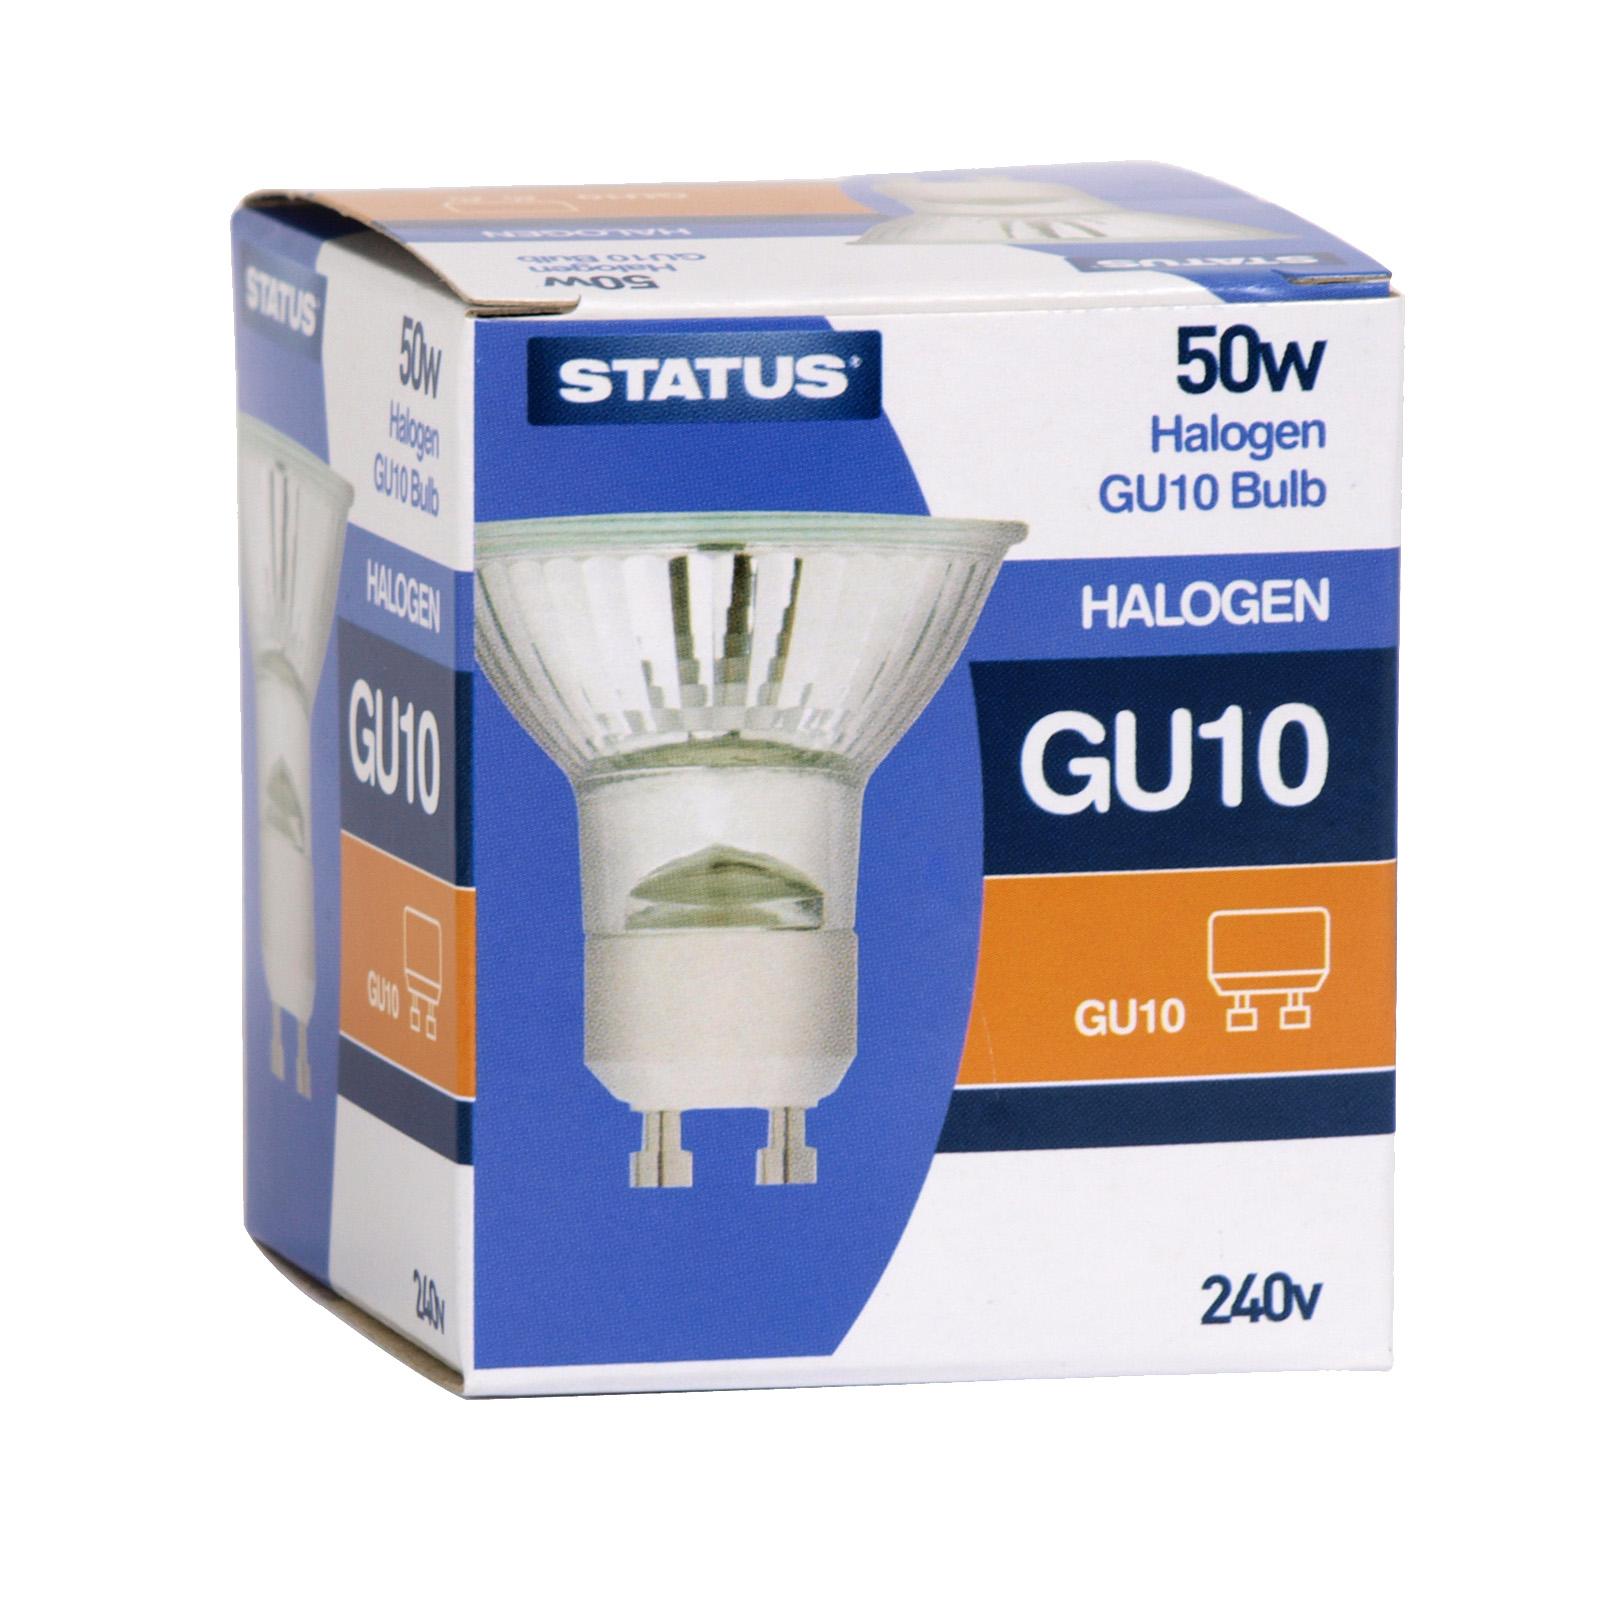 STATUS HALOGEN LIGHT BULB GU10 240V 50W